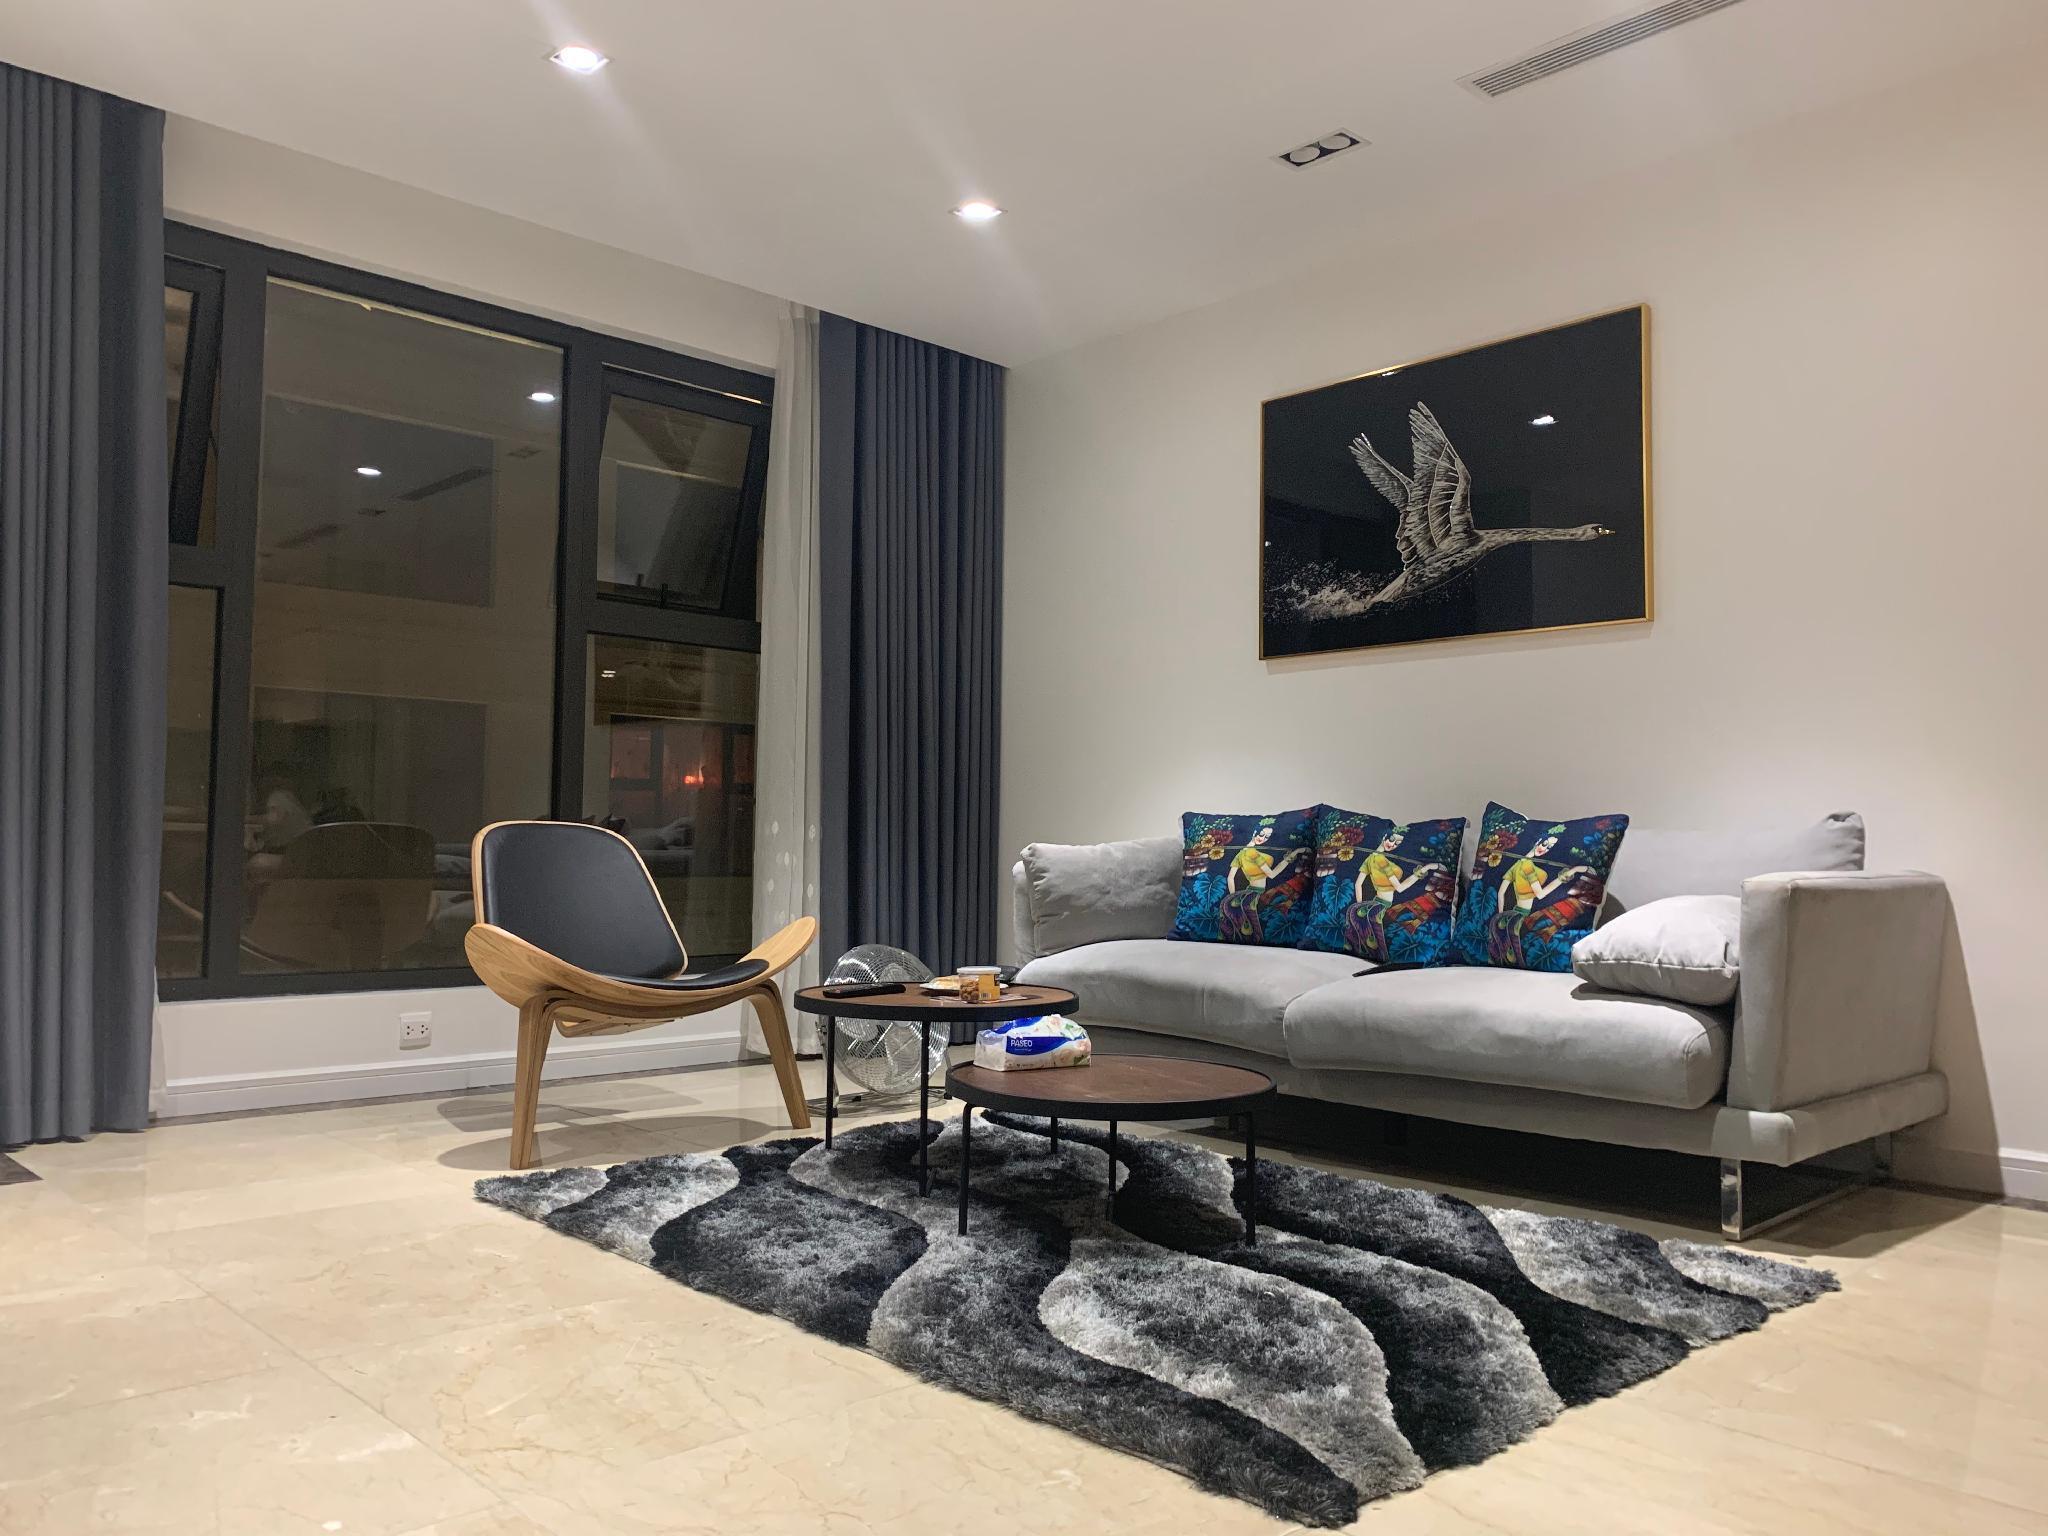 Westlake priemium modern apartment